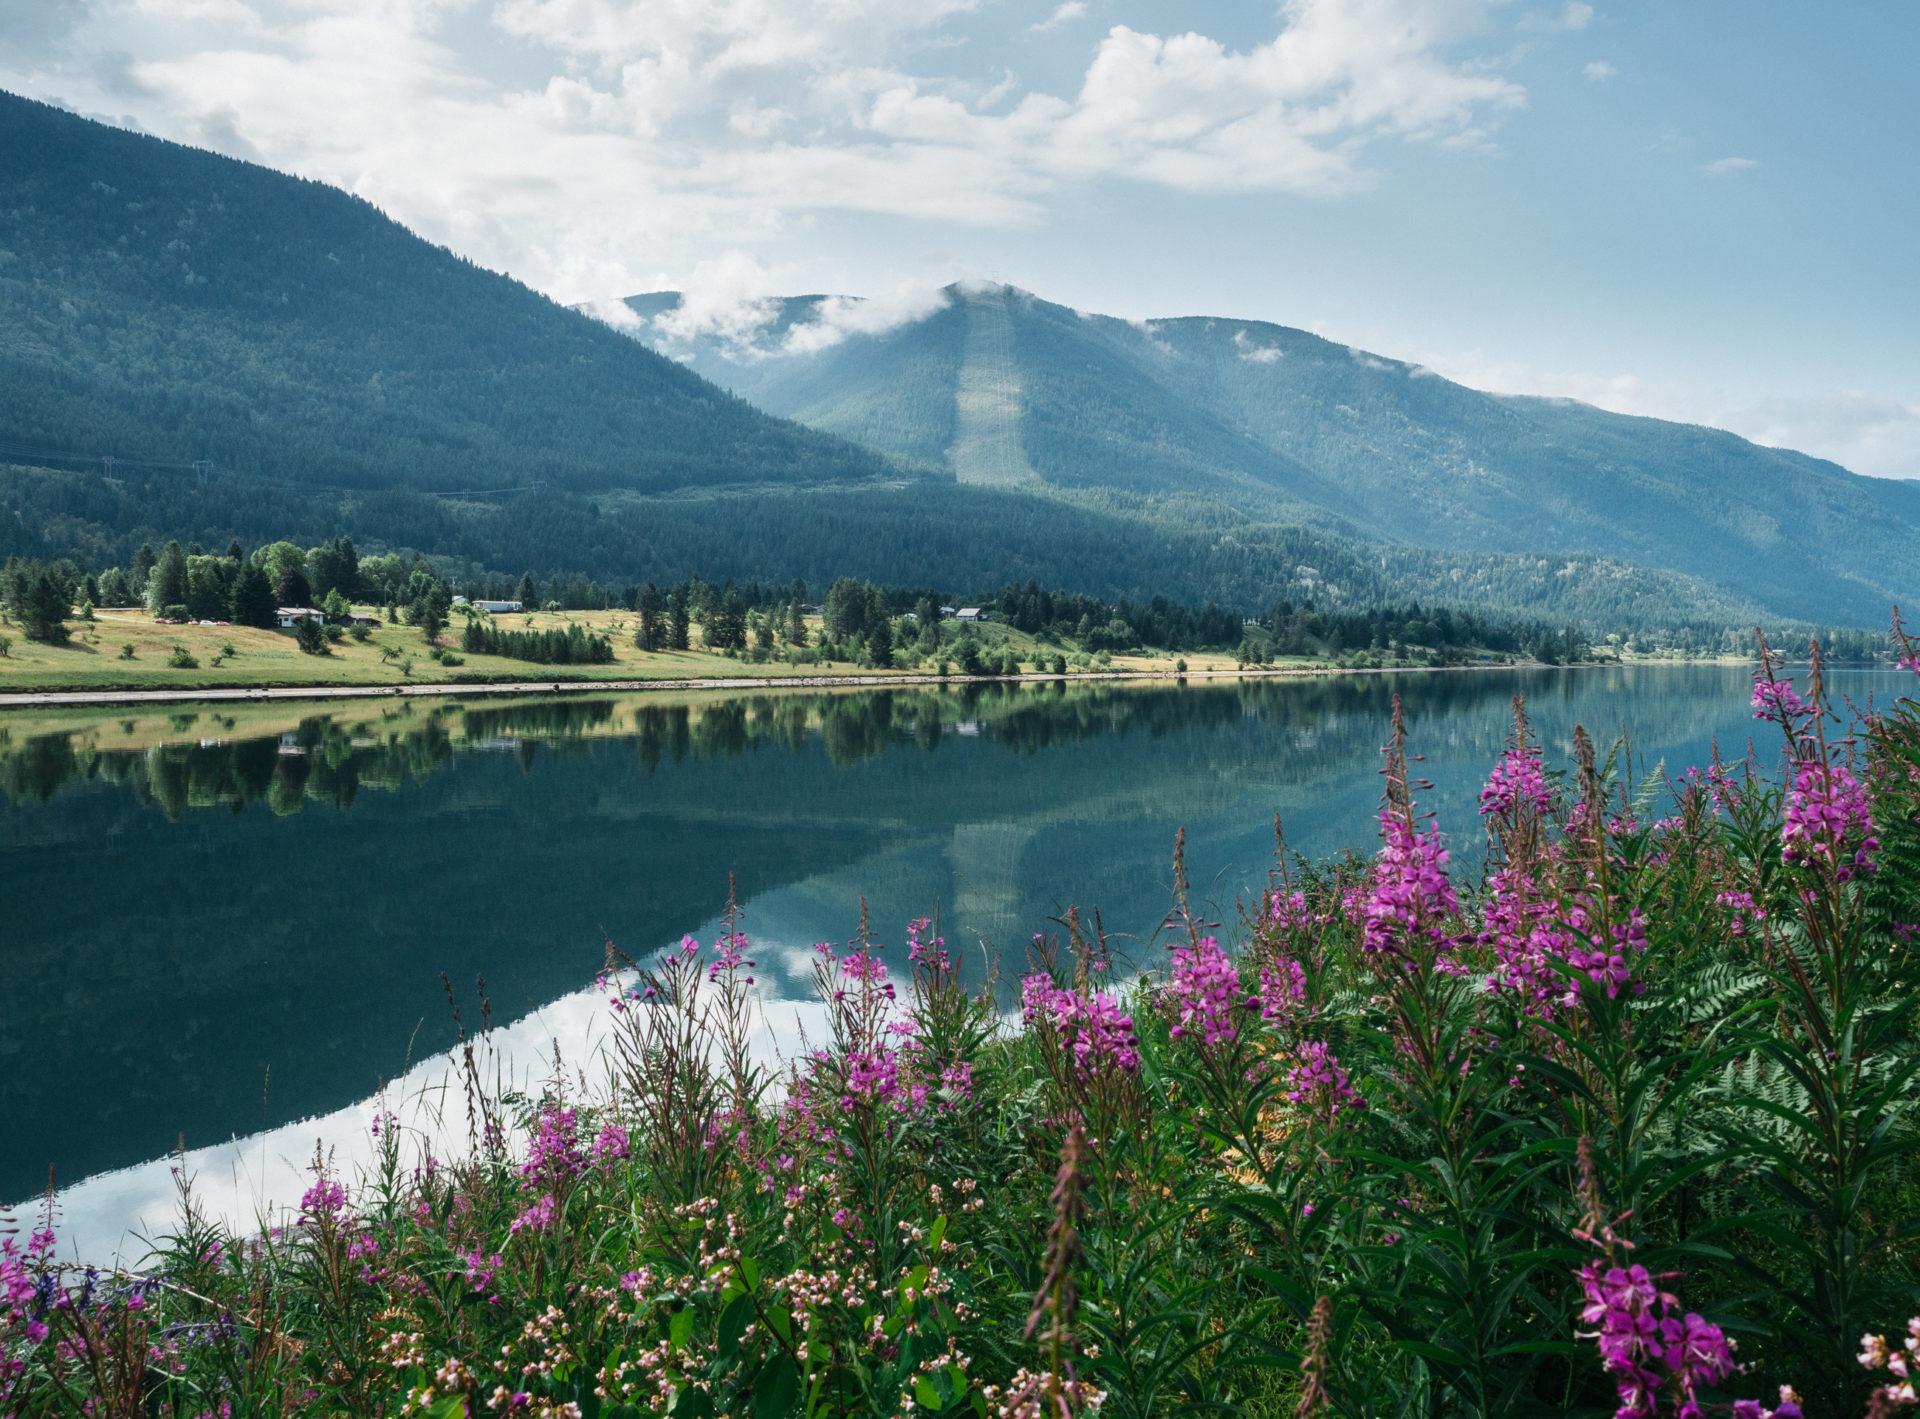 Glade Watershed Kootenay River Louis Bockner